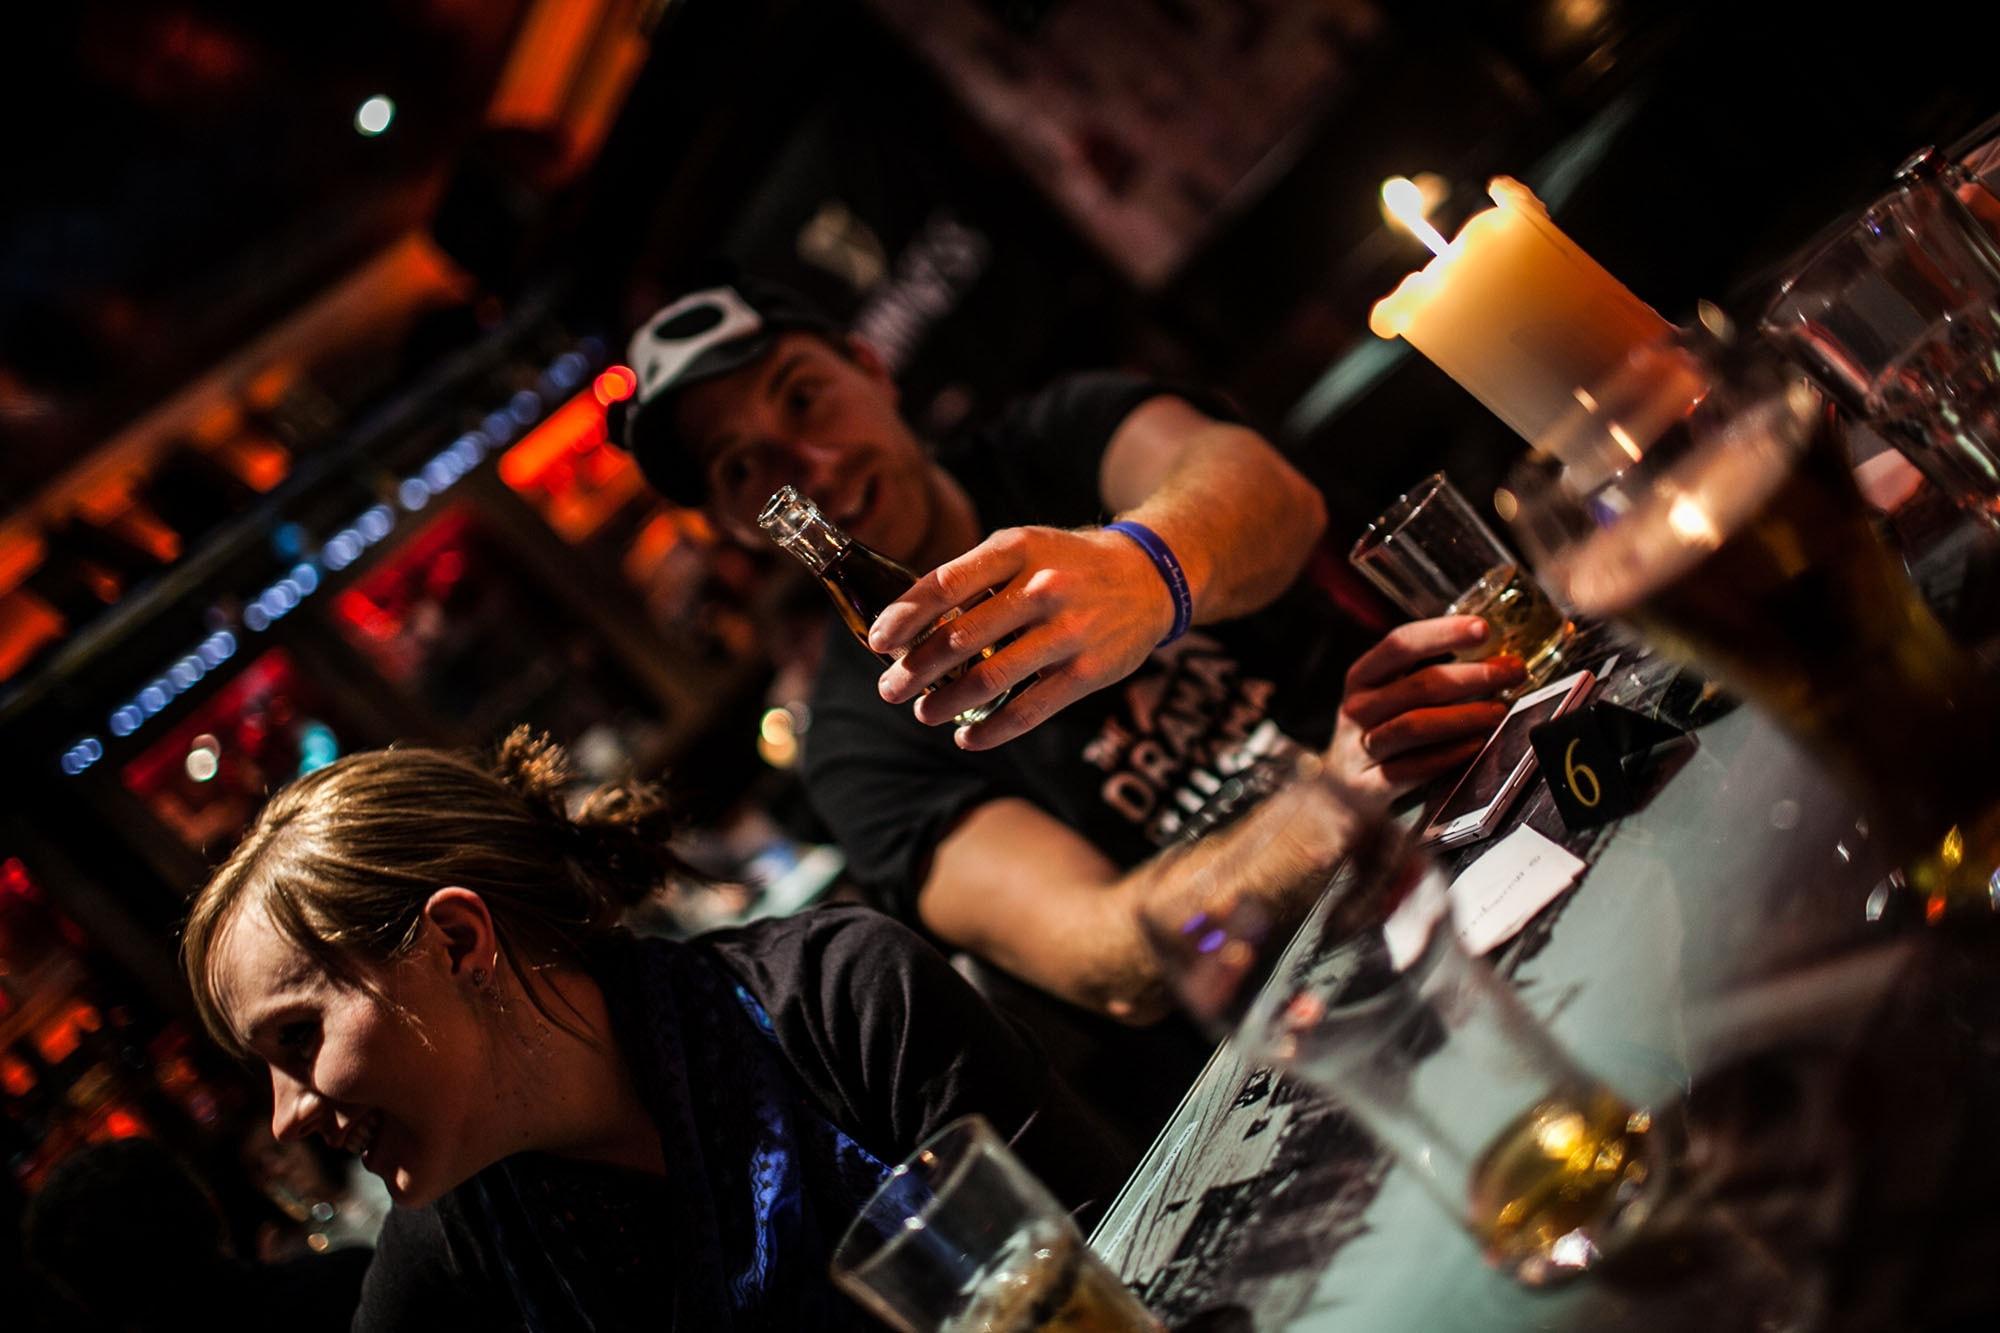 Drinking pints at a pub in Dublin, Ireland